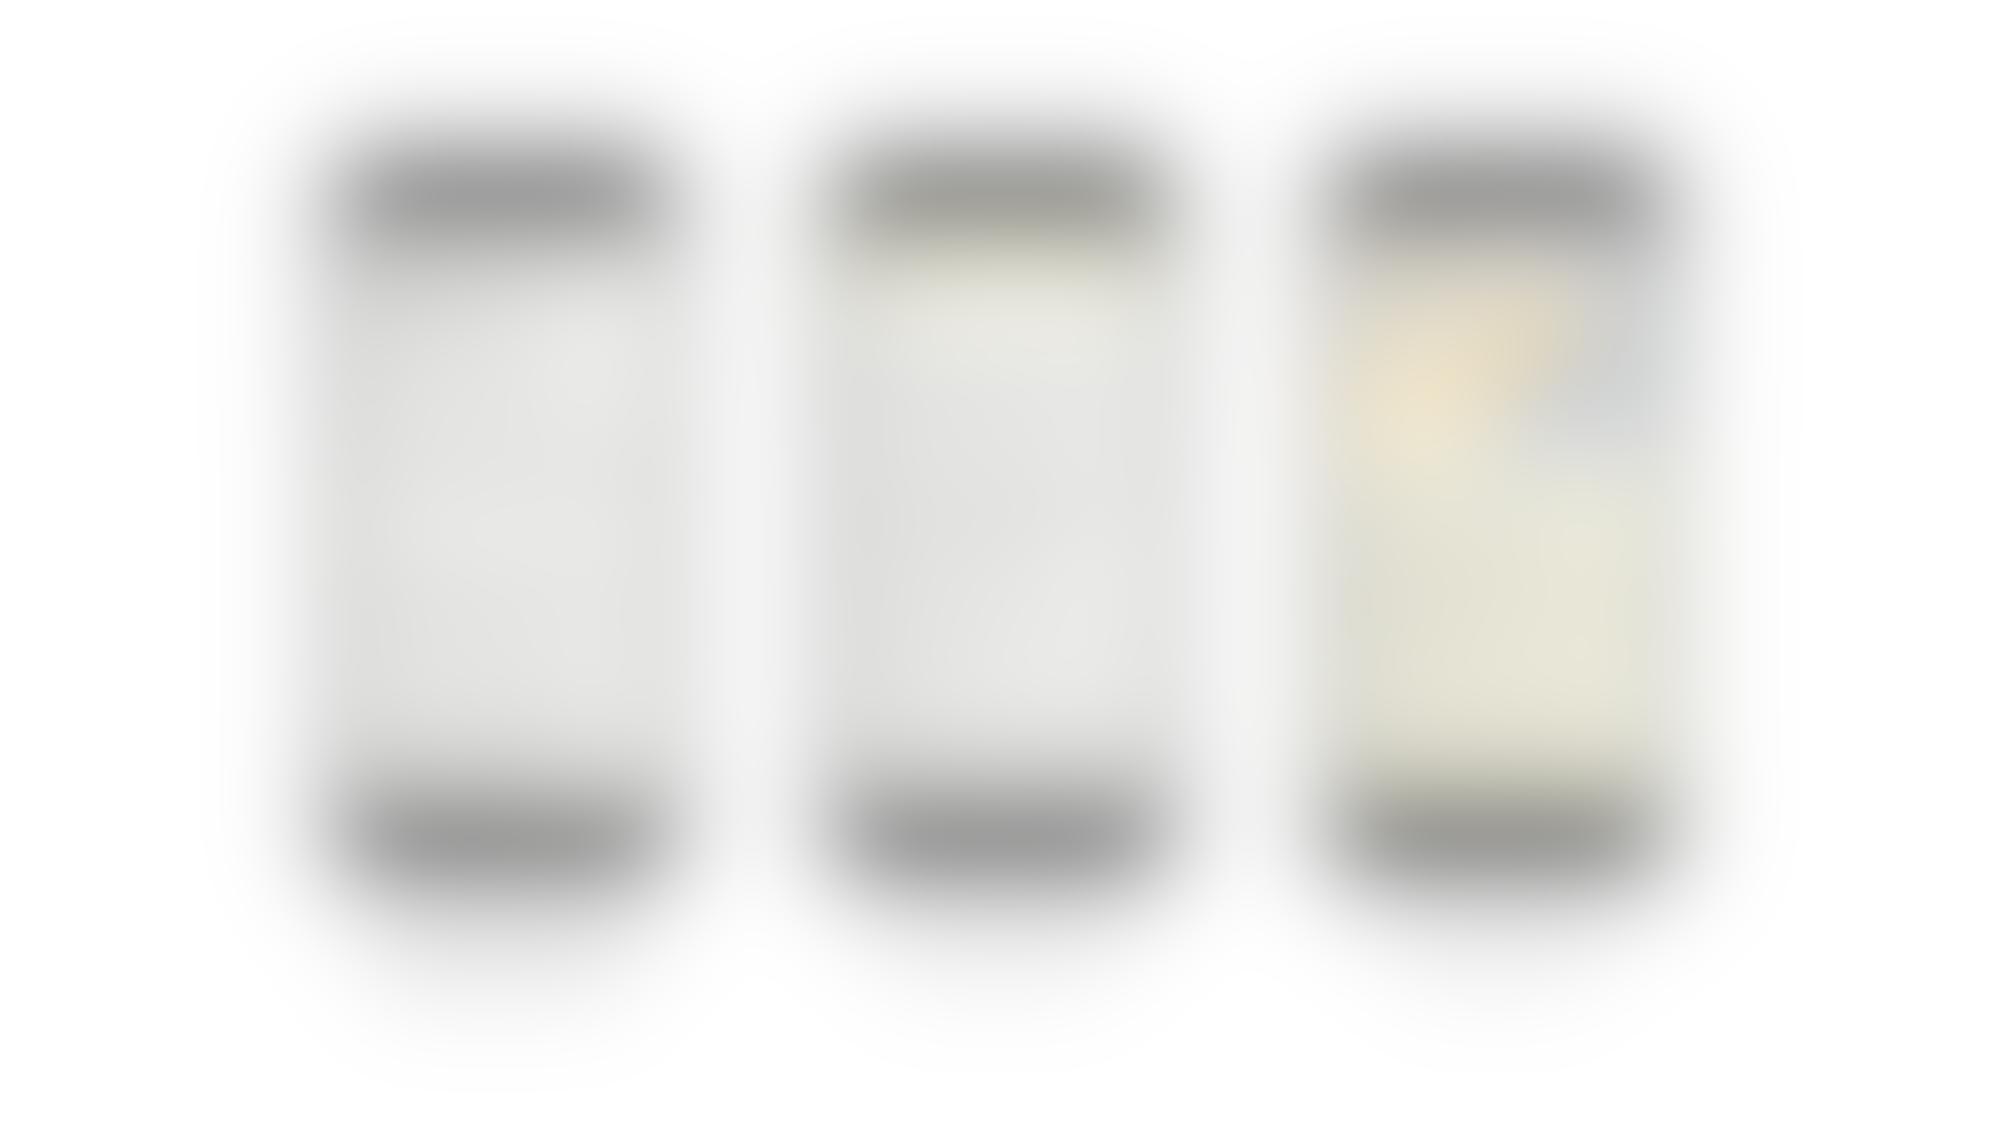 Mathieuheader autocompressfitresizeixlibphp 1 1 0max h2000max w3 D2000q80s5f1e75deb0c64afa2e6f09c8dff64bc0